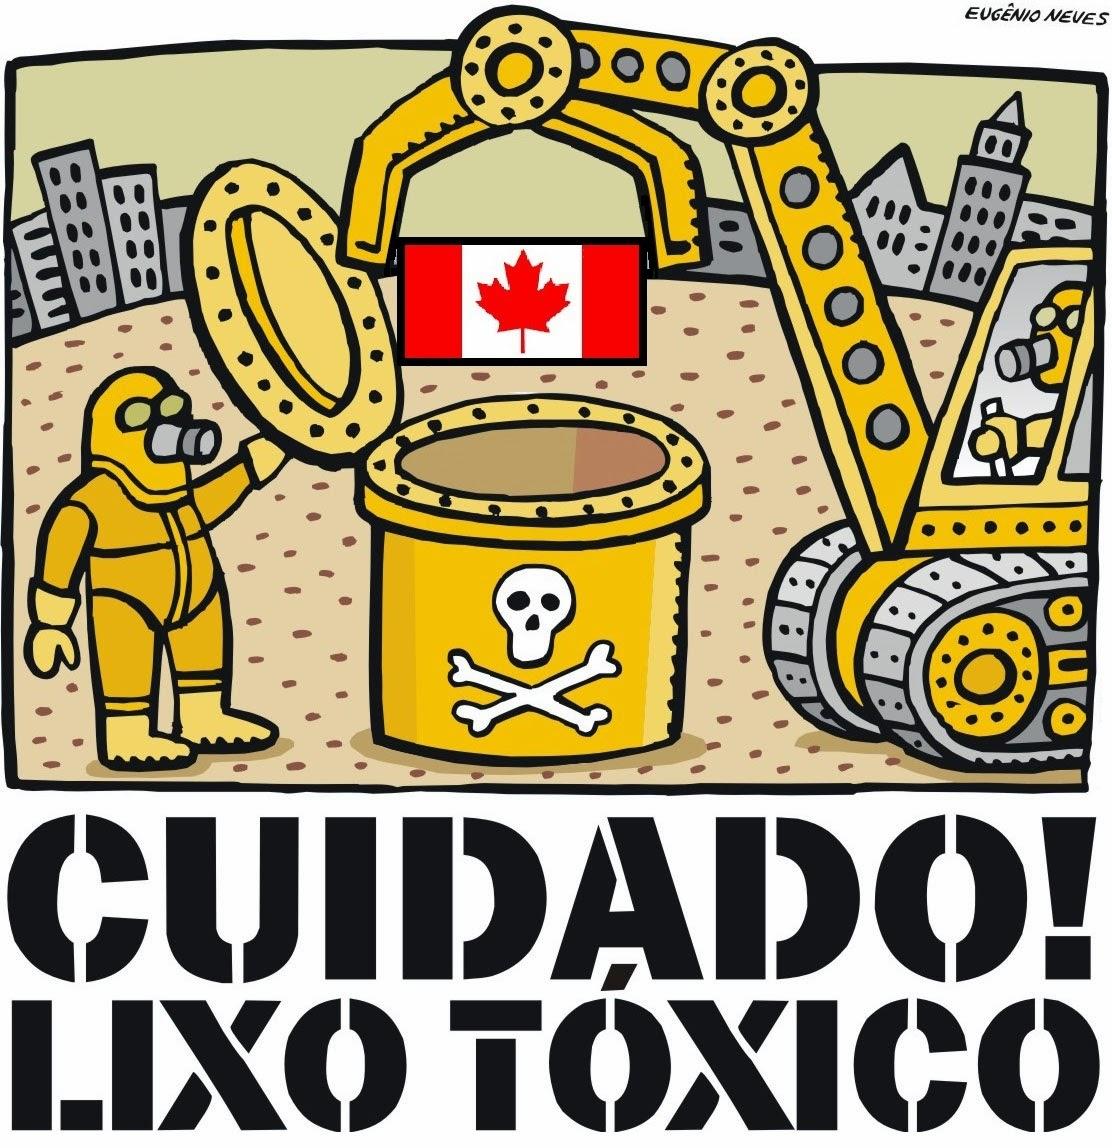 Eugenio Neves (edited): Cuidado! Lixo Tóxico - Stephen Harper's Canada.